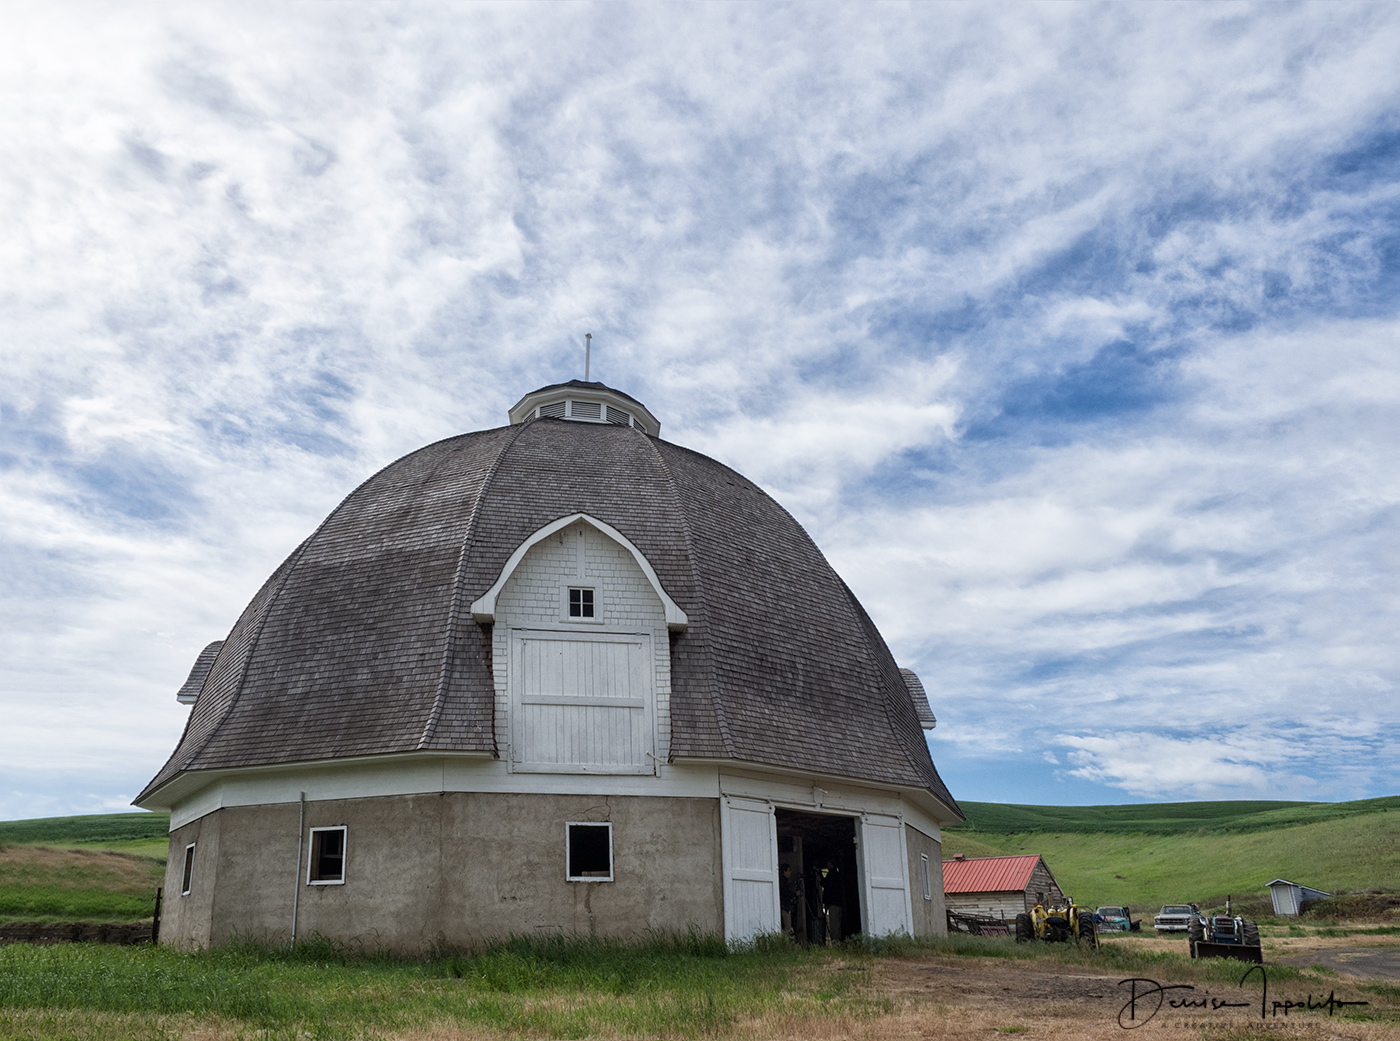 Steinke round barn, captured in 2017 by Denise Ippolito